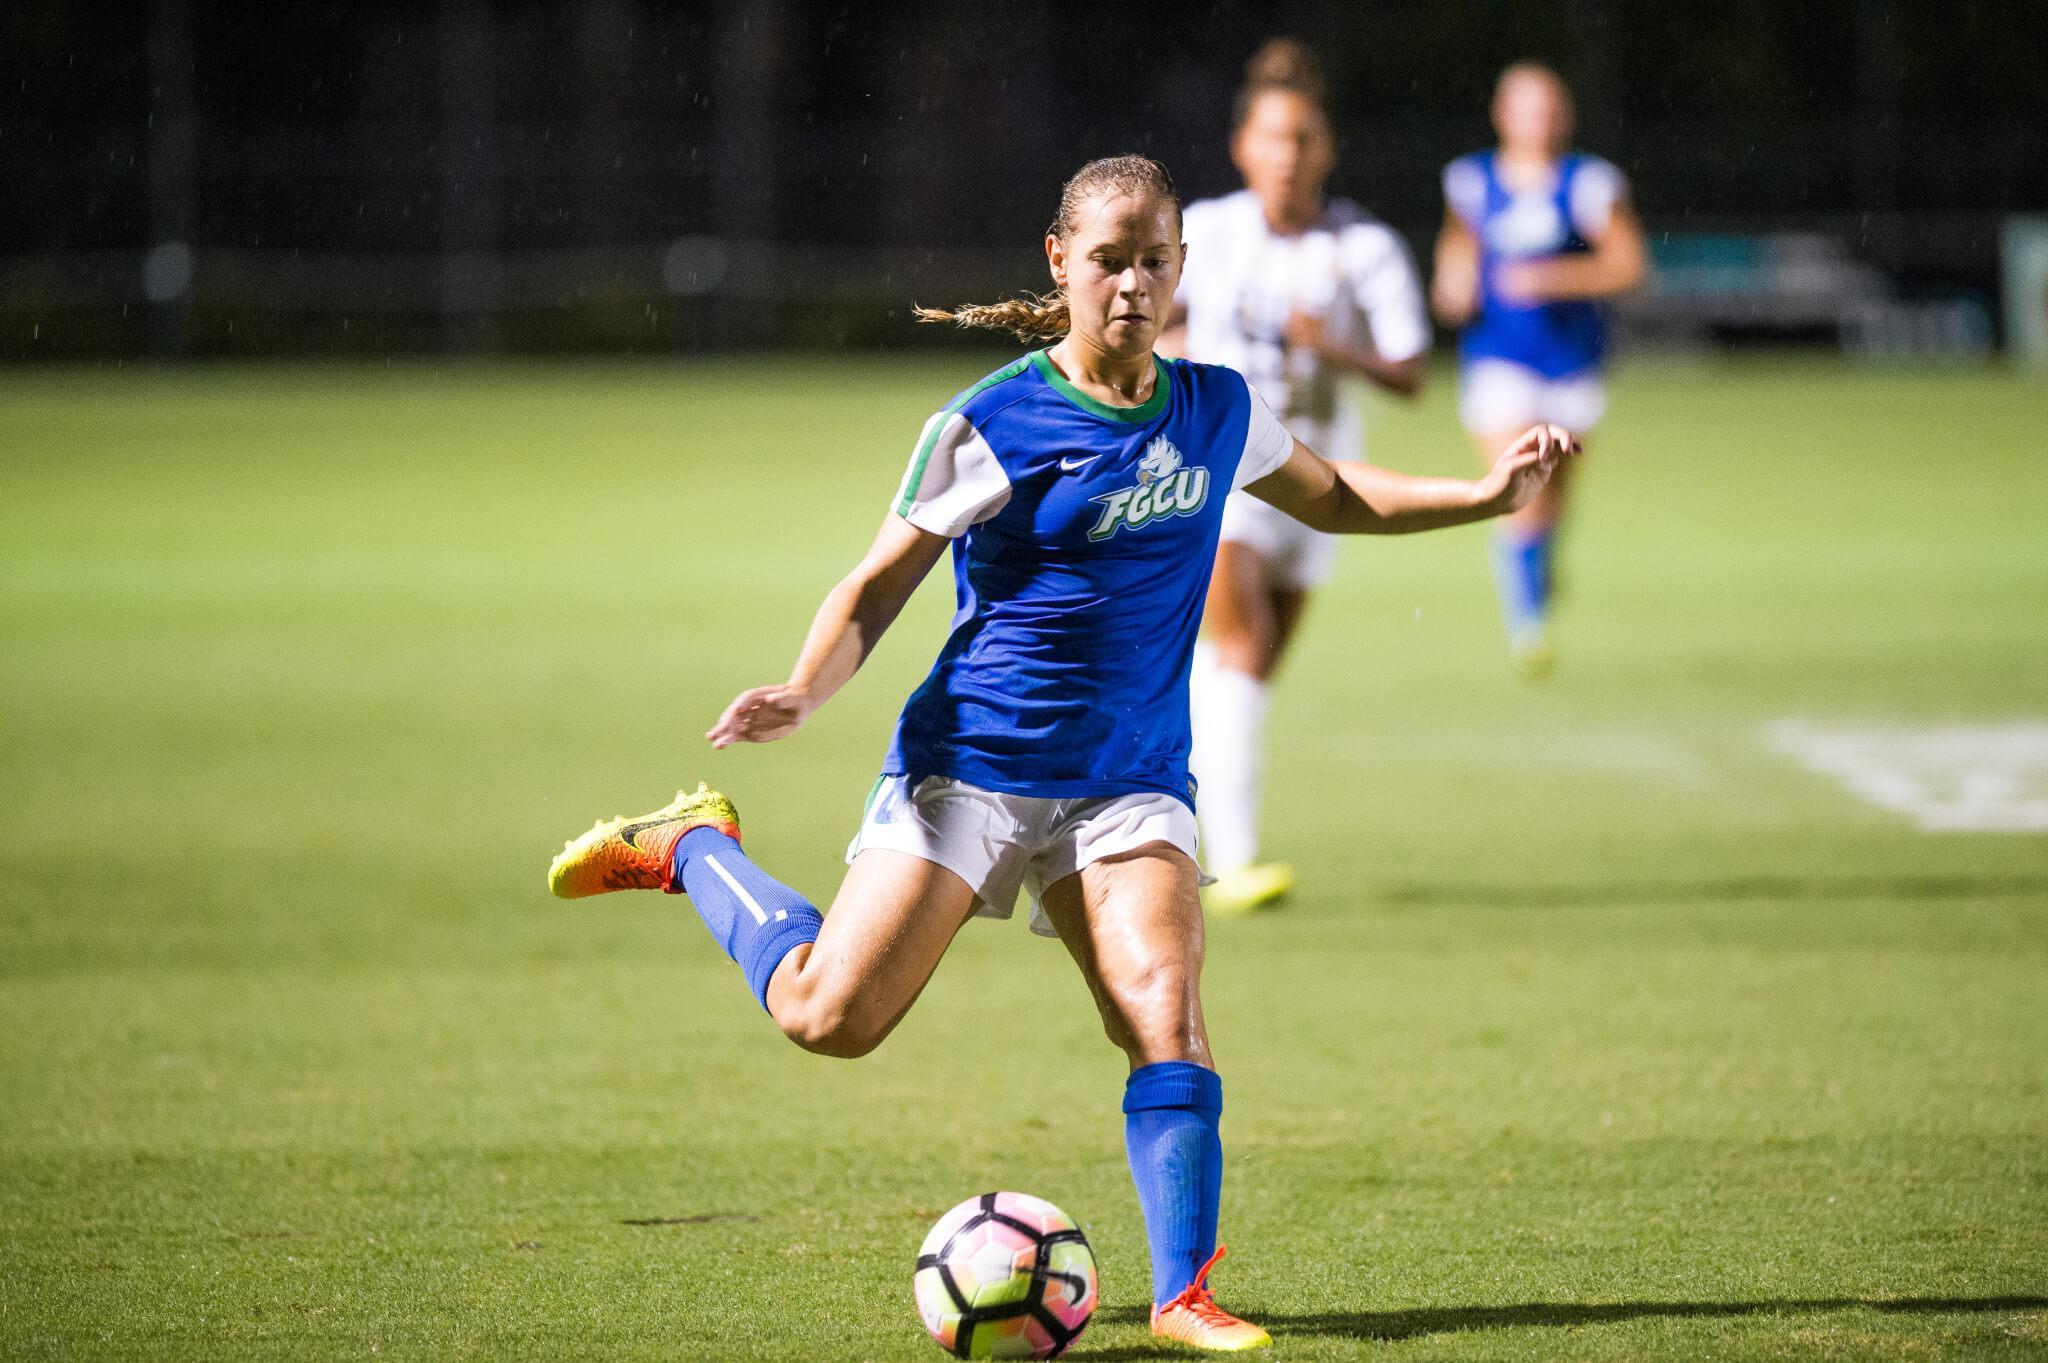 Preview: FGCU women's soccer at ASUN Women's Soccer Championship